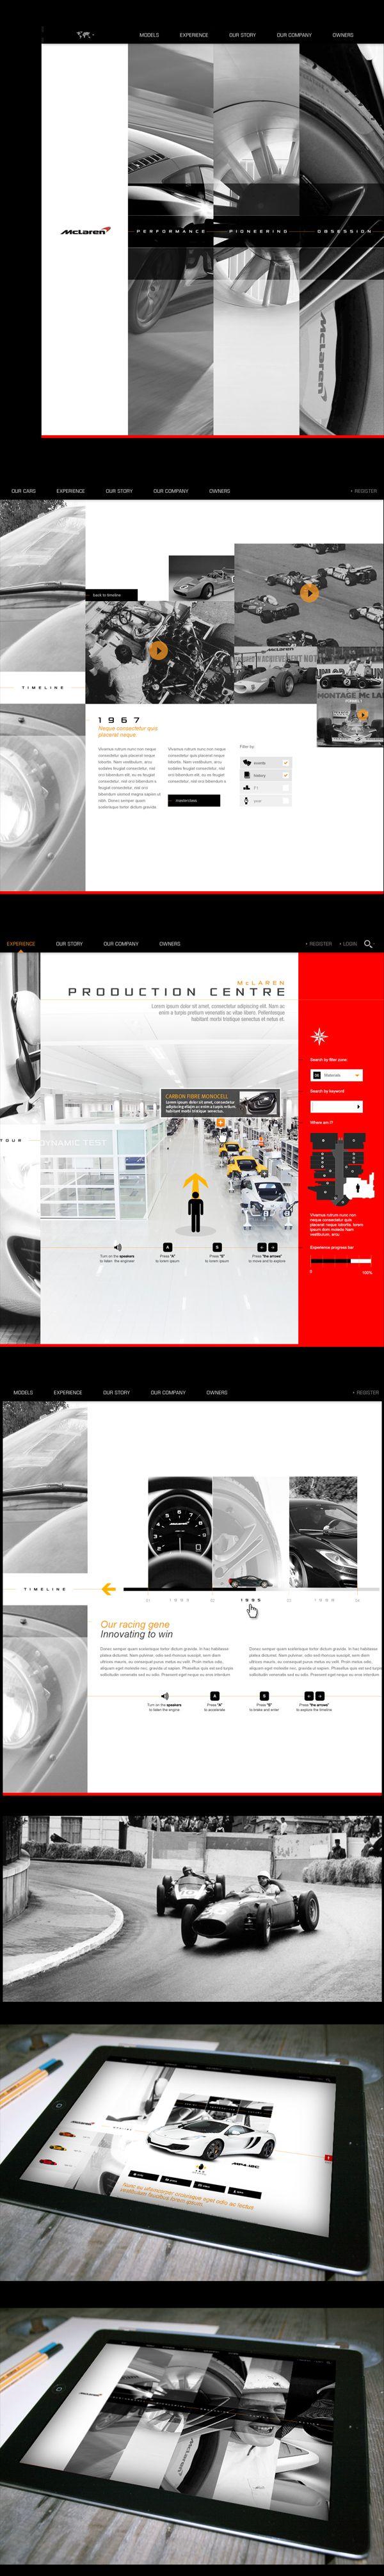 McLaren Automotive Website Pitch by Thomas Moeller, via Behance